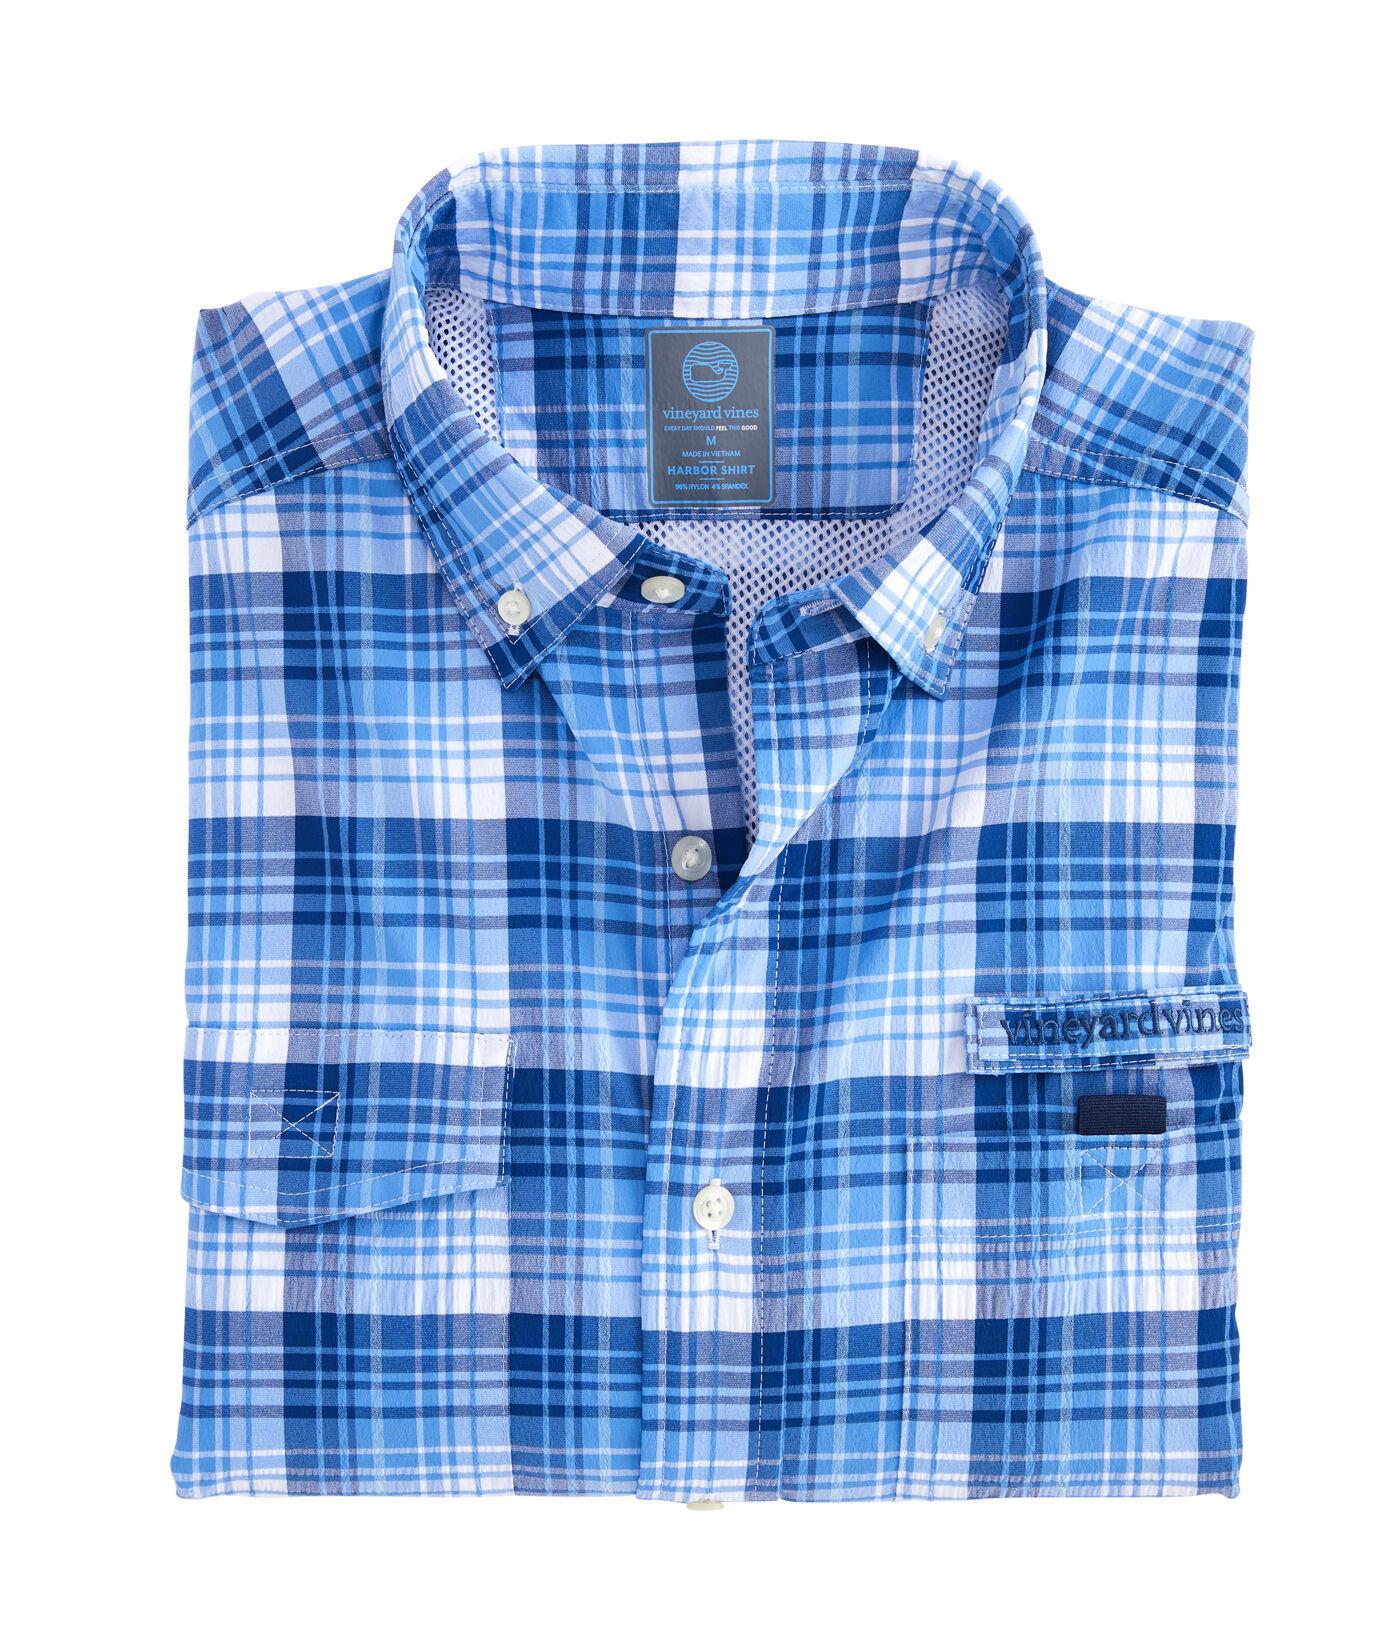 cee997bc69 Vineyard Vines Big & Tall Bighorn Harbor Shirt in Blue for Men - Lyst